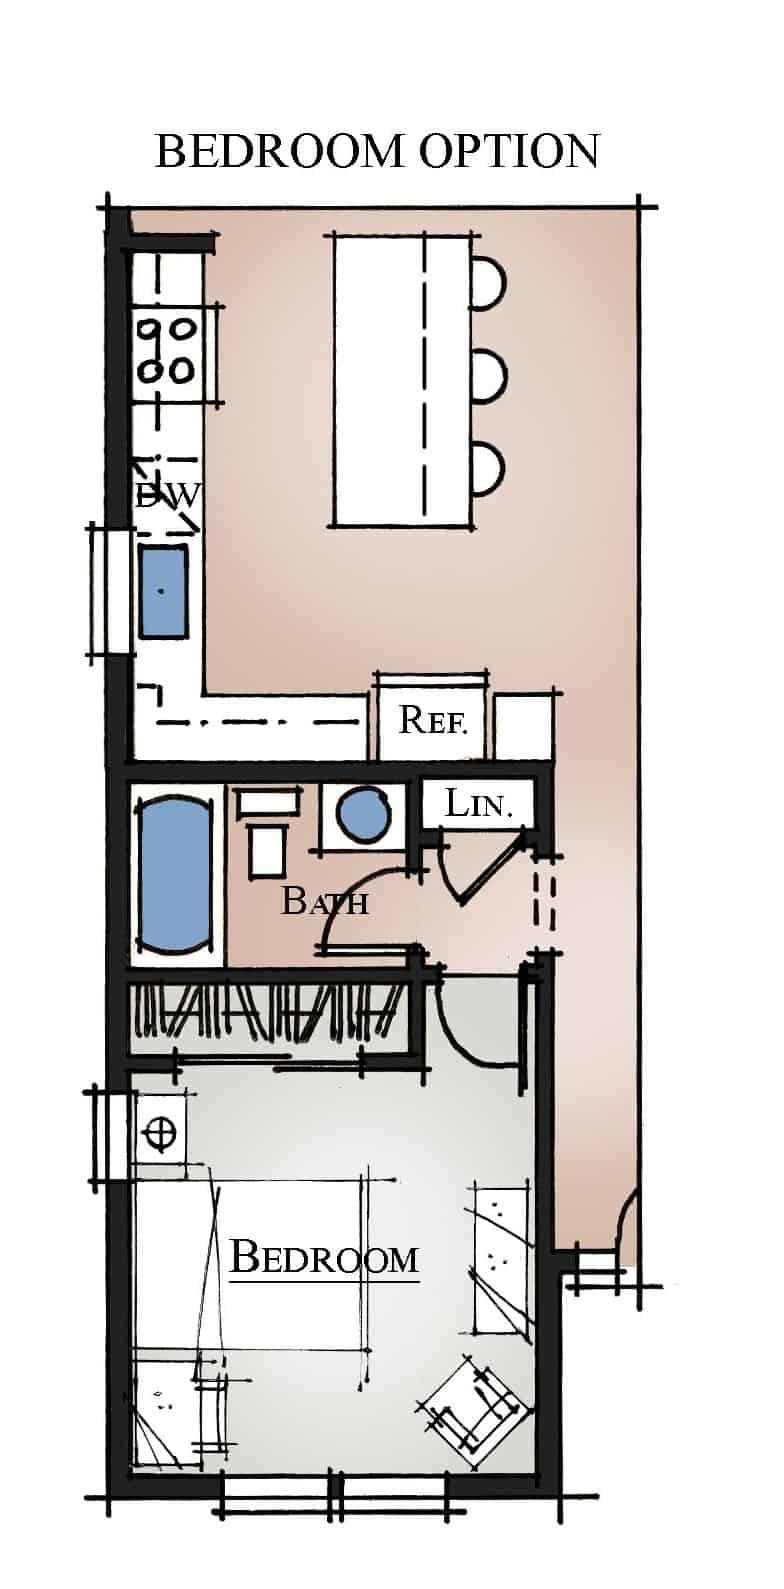 Croton Opt Bedroom 9-24-19